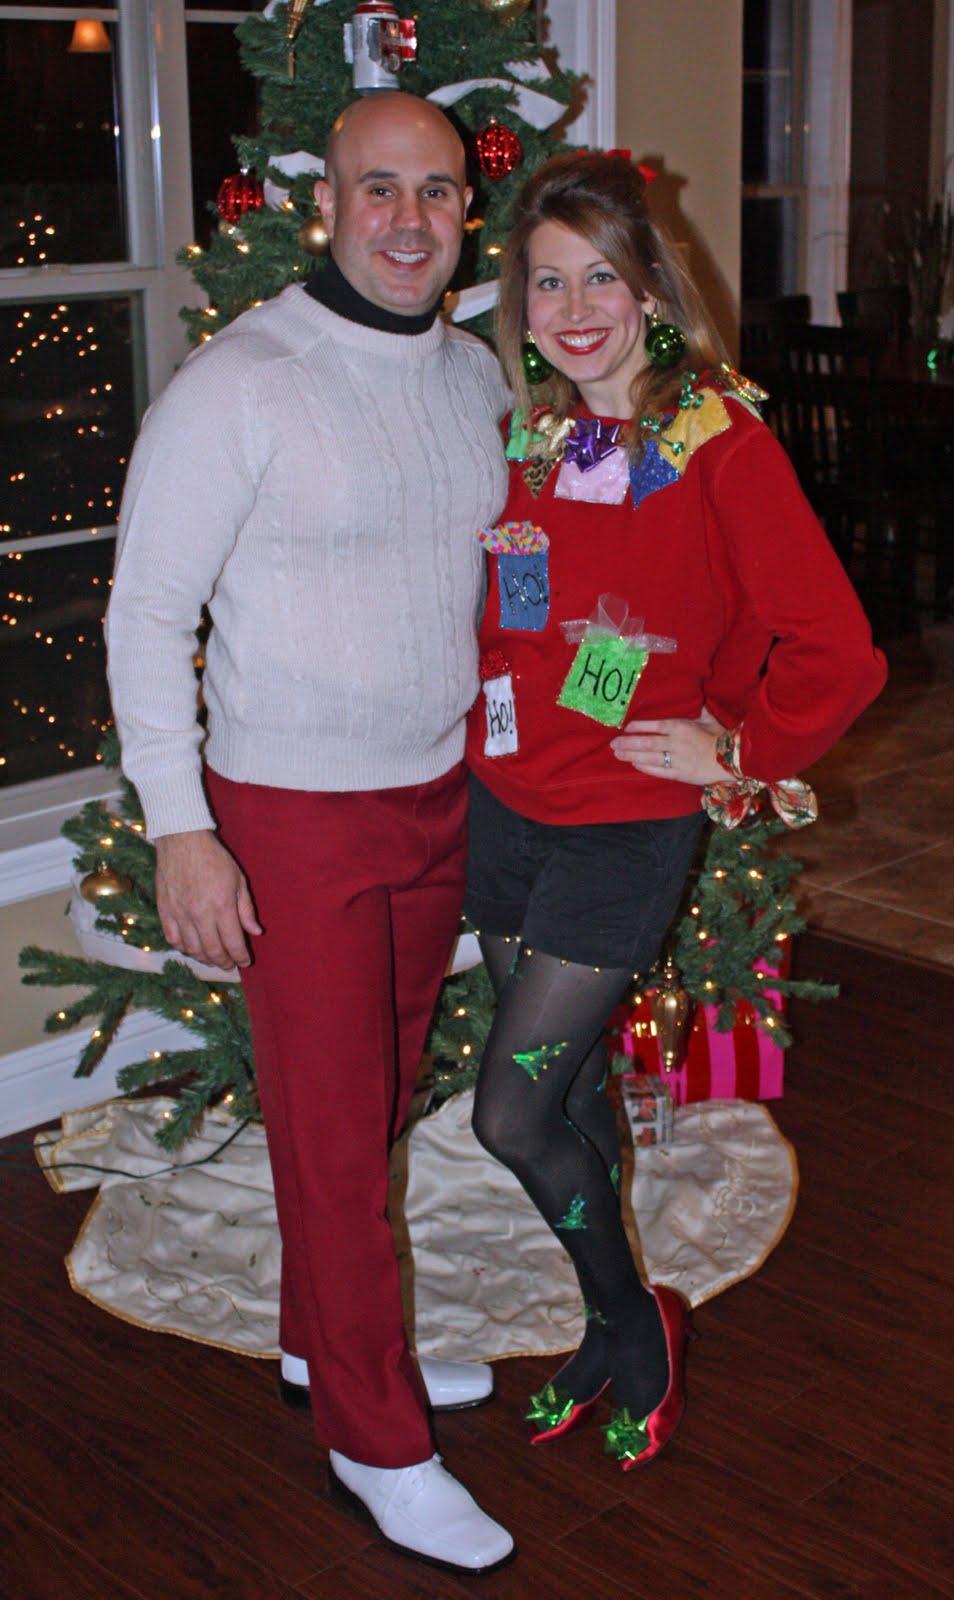 The Doyal Diaries: Tacky Christmas Party 2010